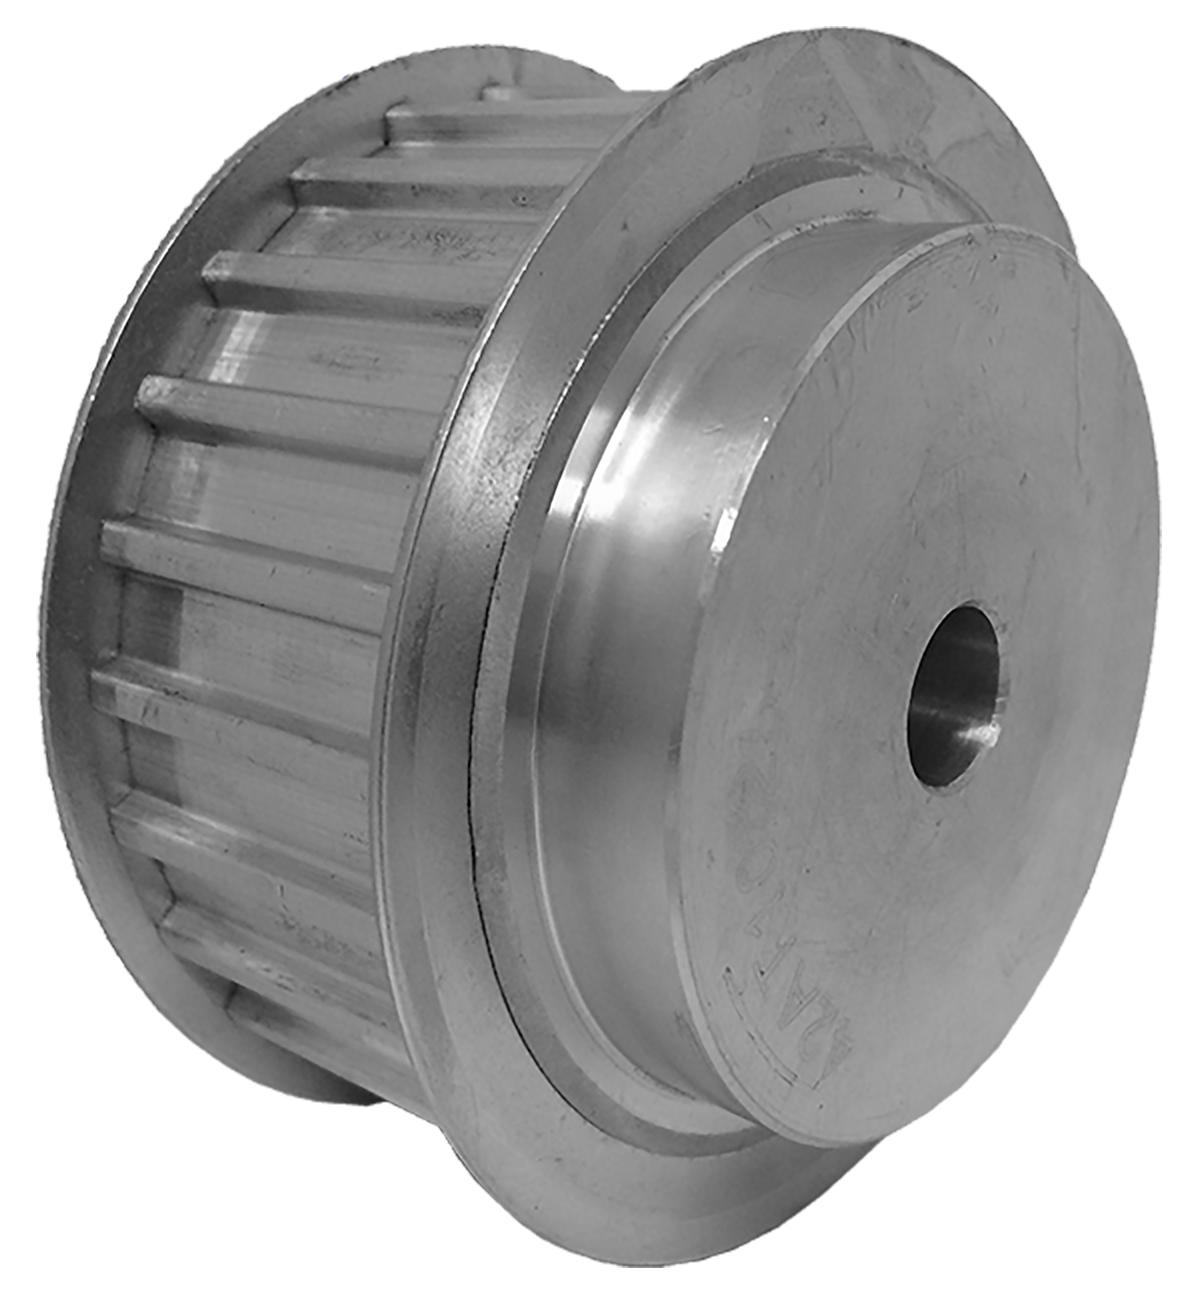 42AT10/25-2 - Aluminum Metric Pulleys